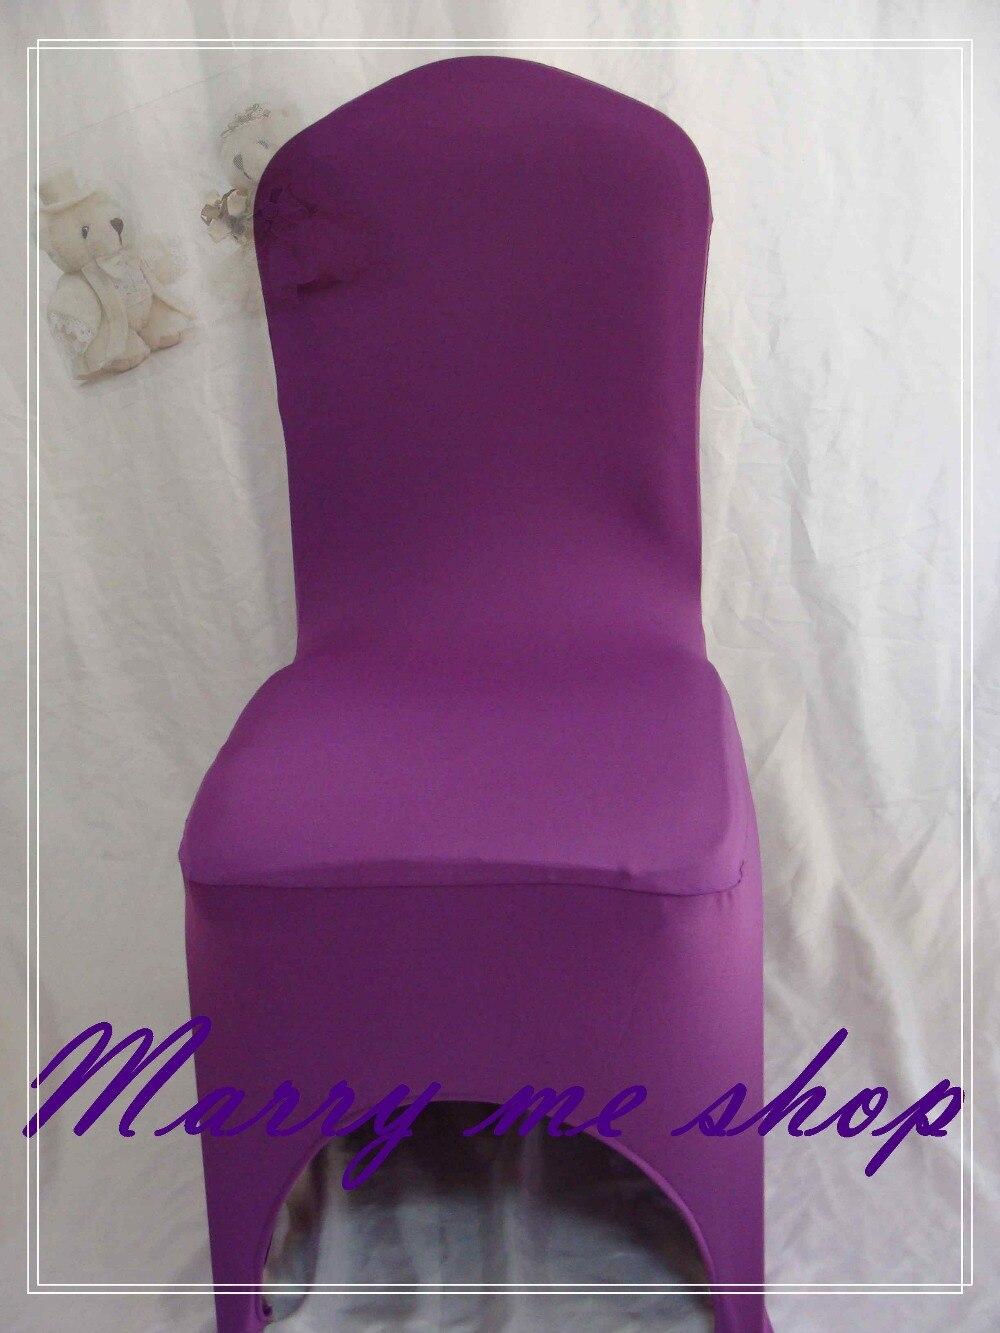 Banquet chair covers - Banquet Chair Covers For Sale